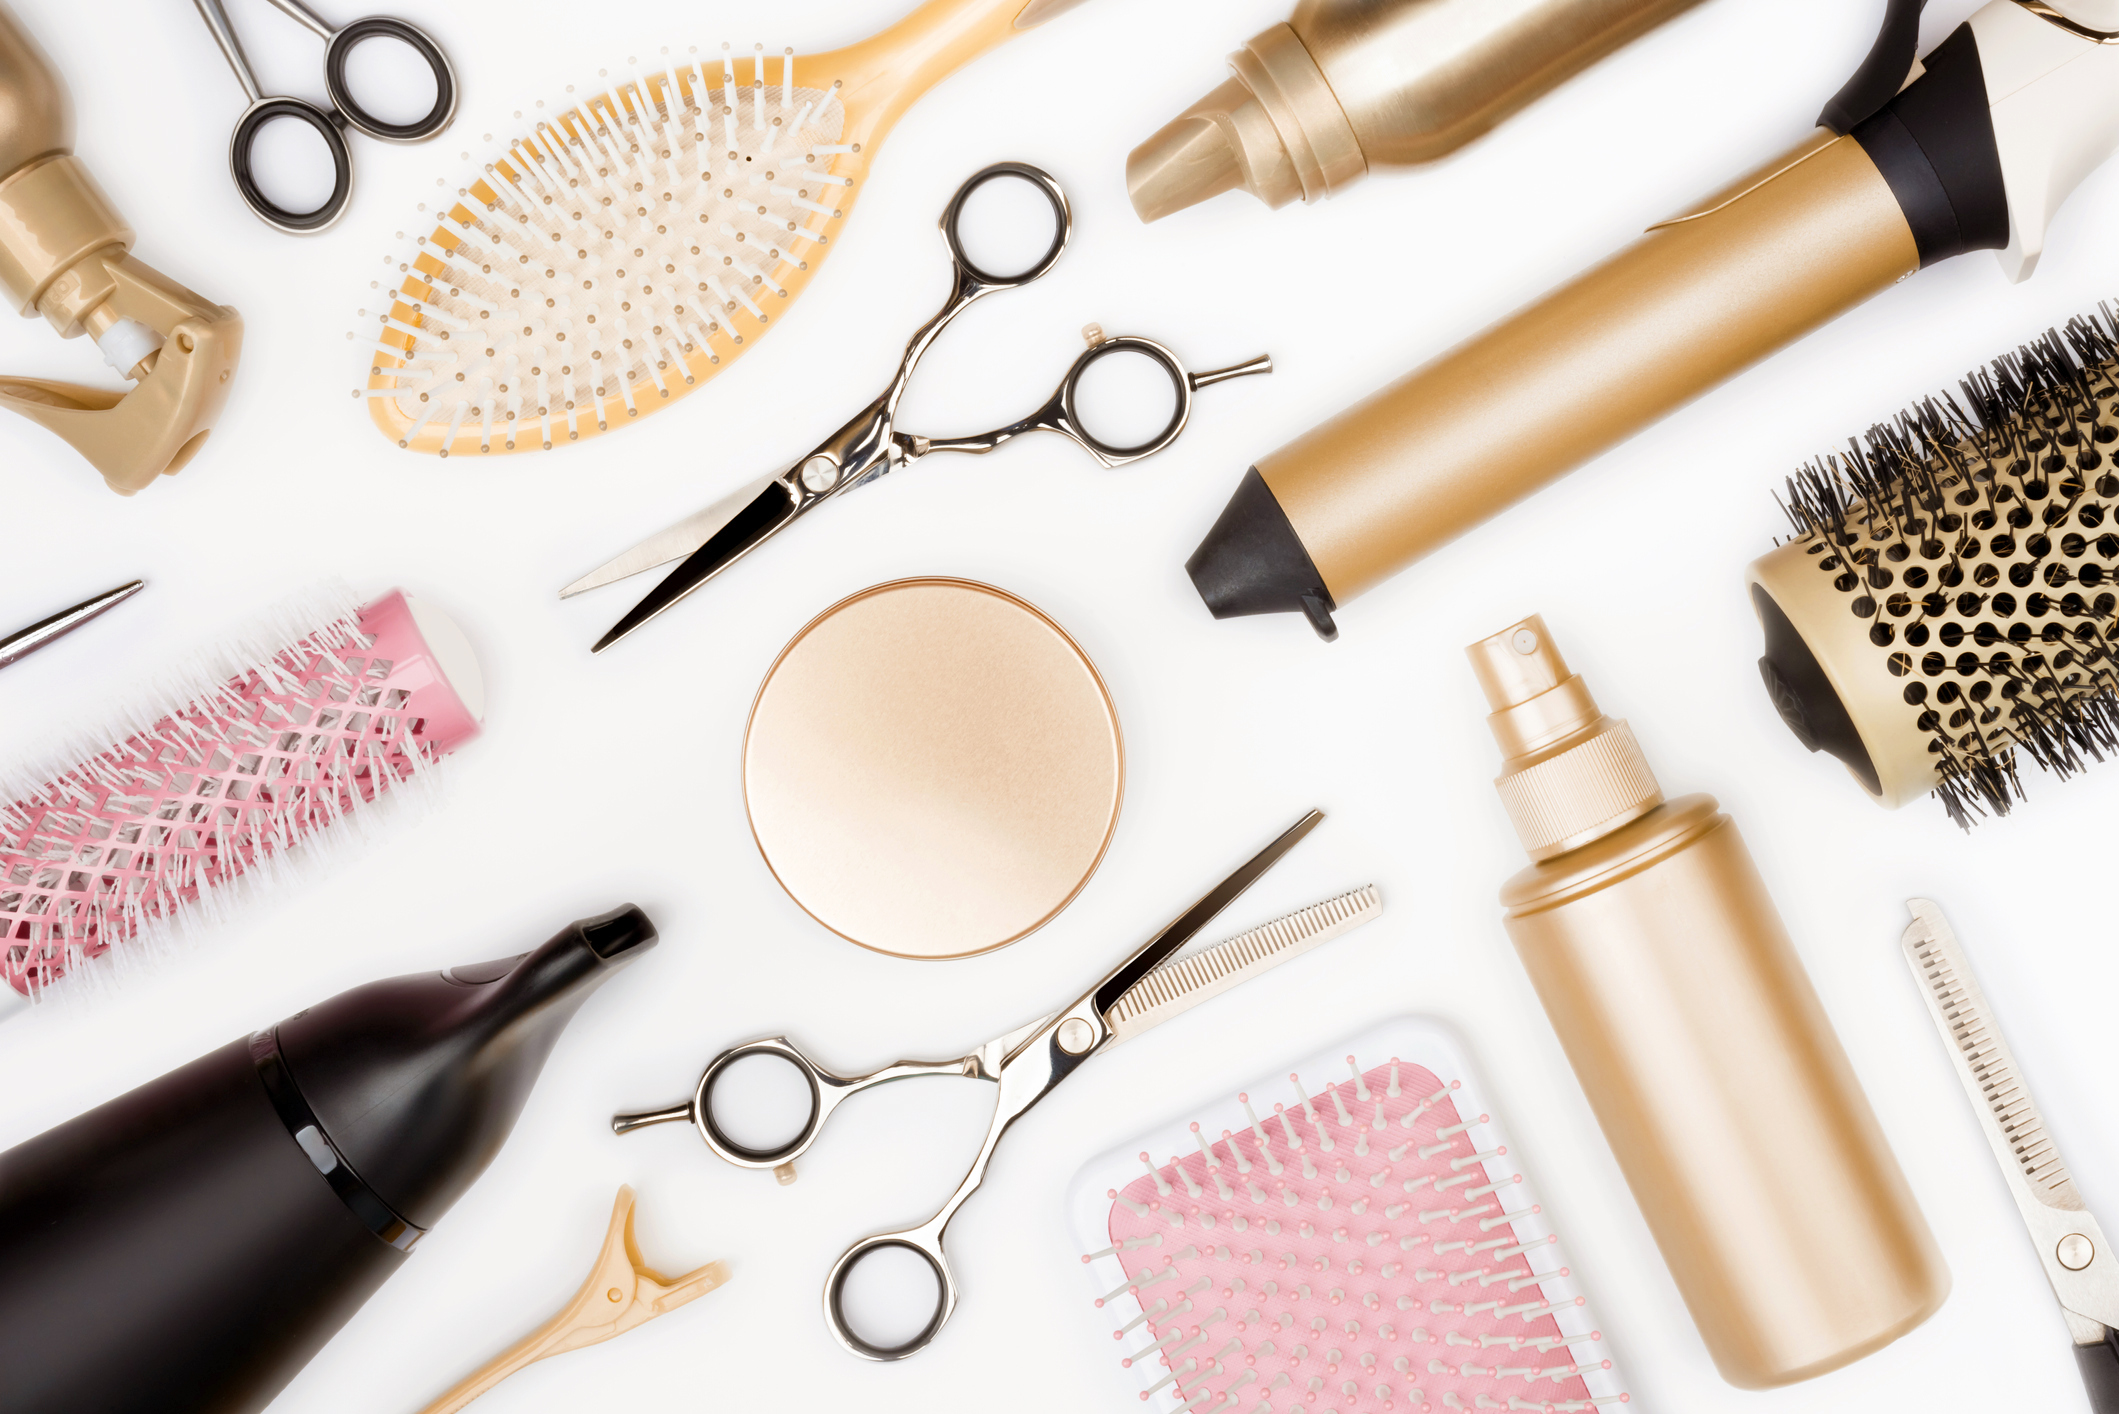 Hair Styling Equipment | LoveToKnow